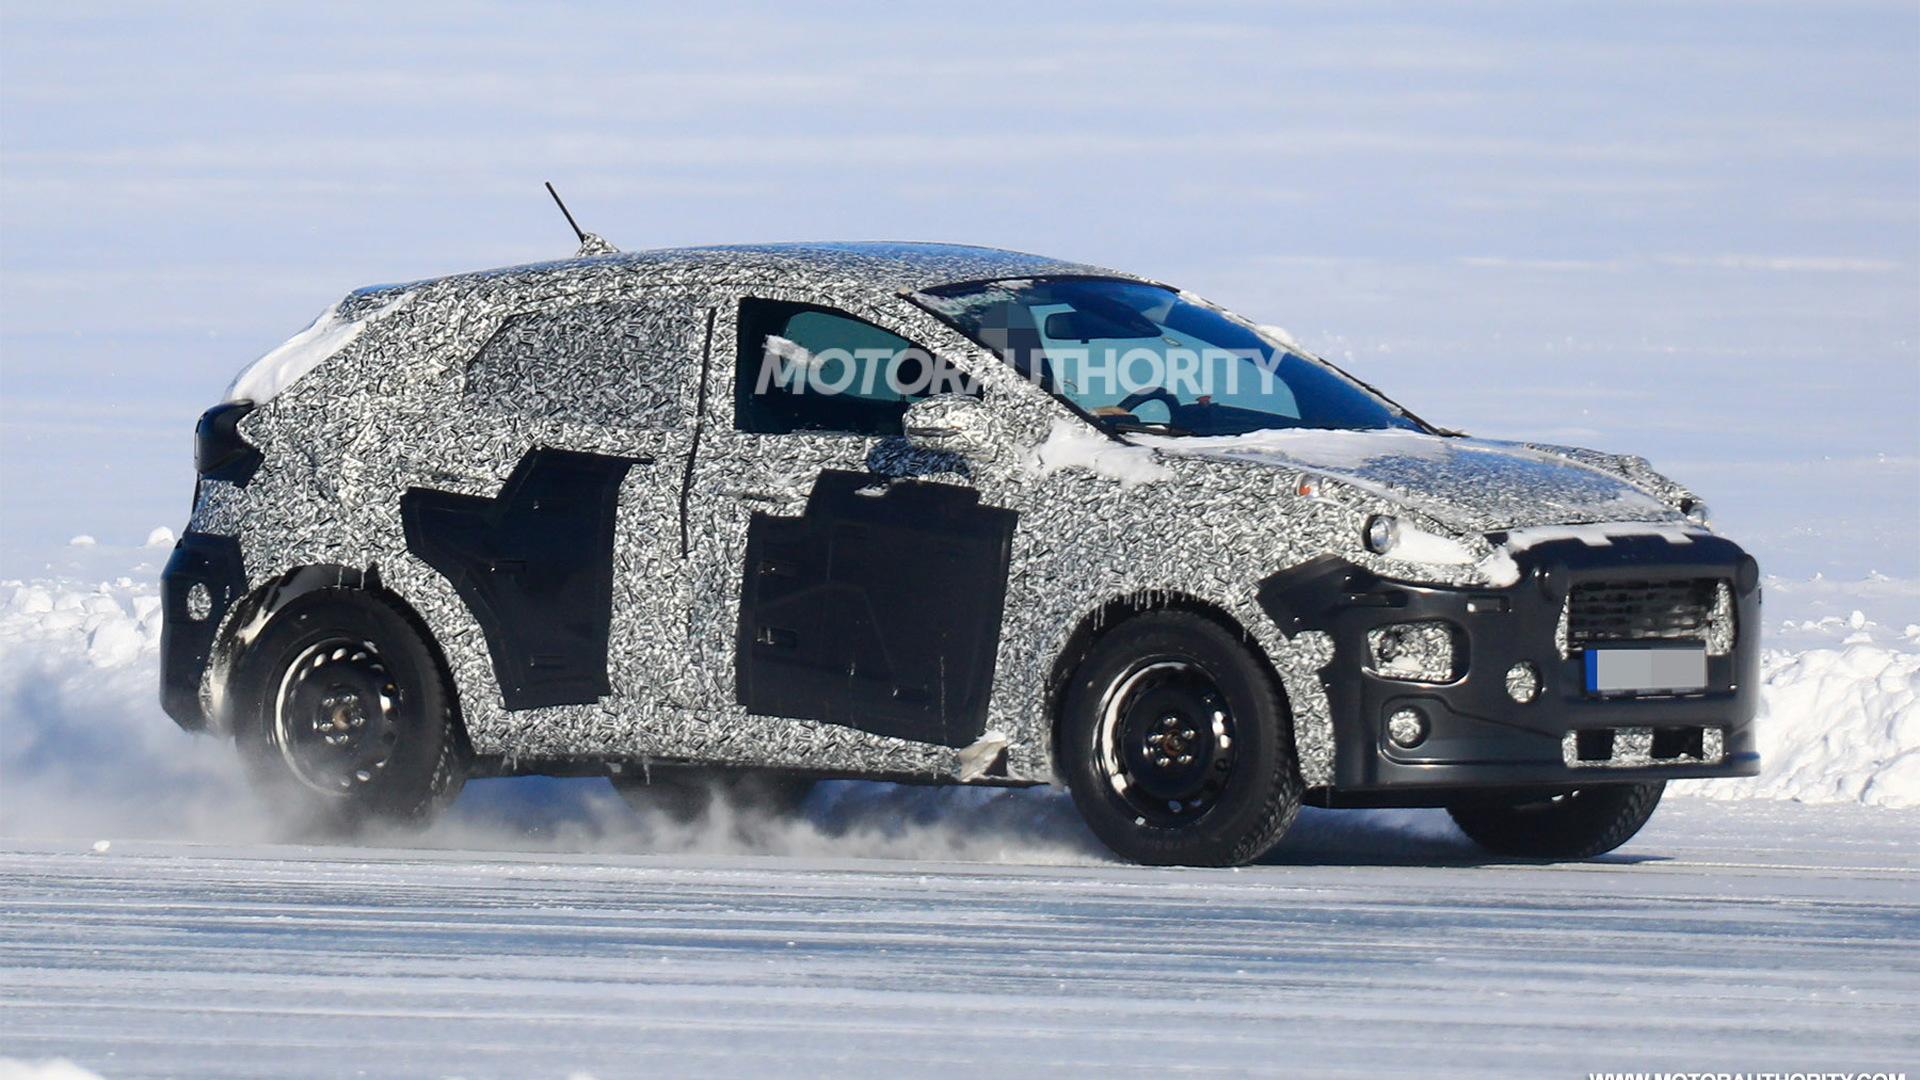 2020 Ford EcoSport Spy Photos And New Generation >> 2021 Ford Puma Spy Shots